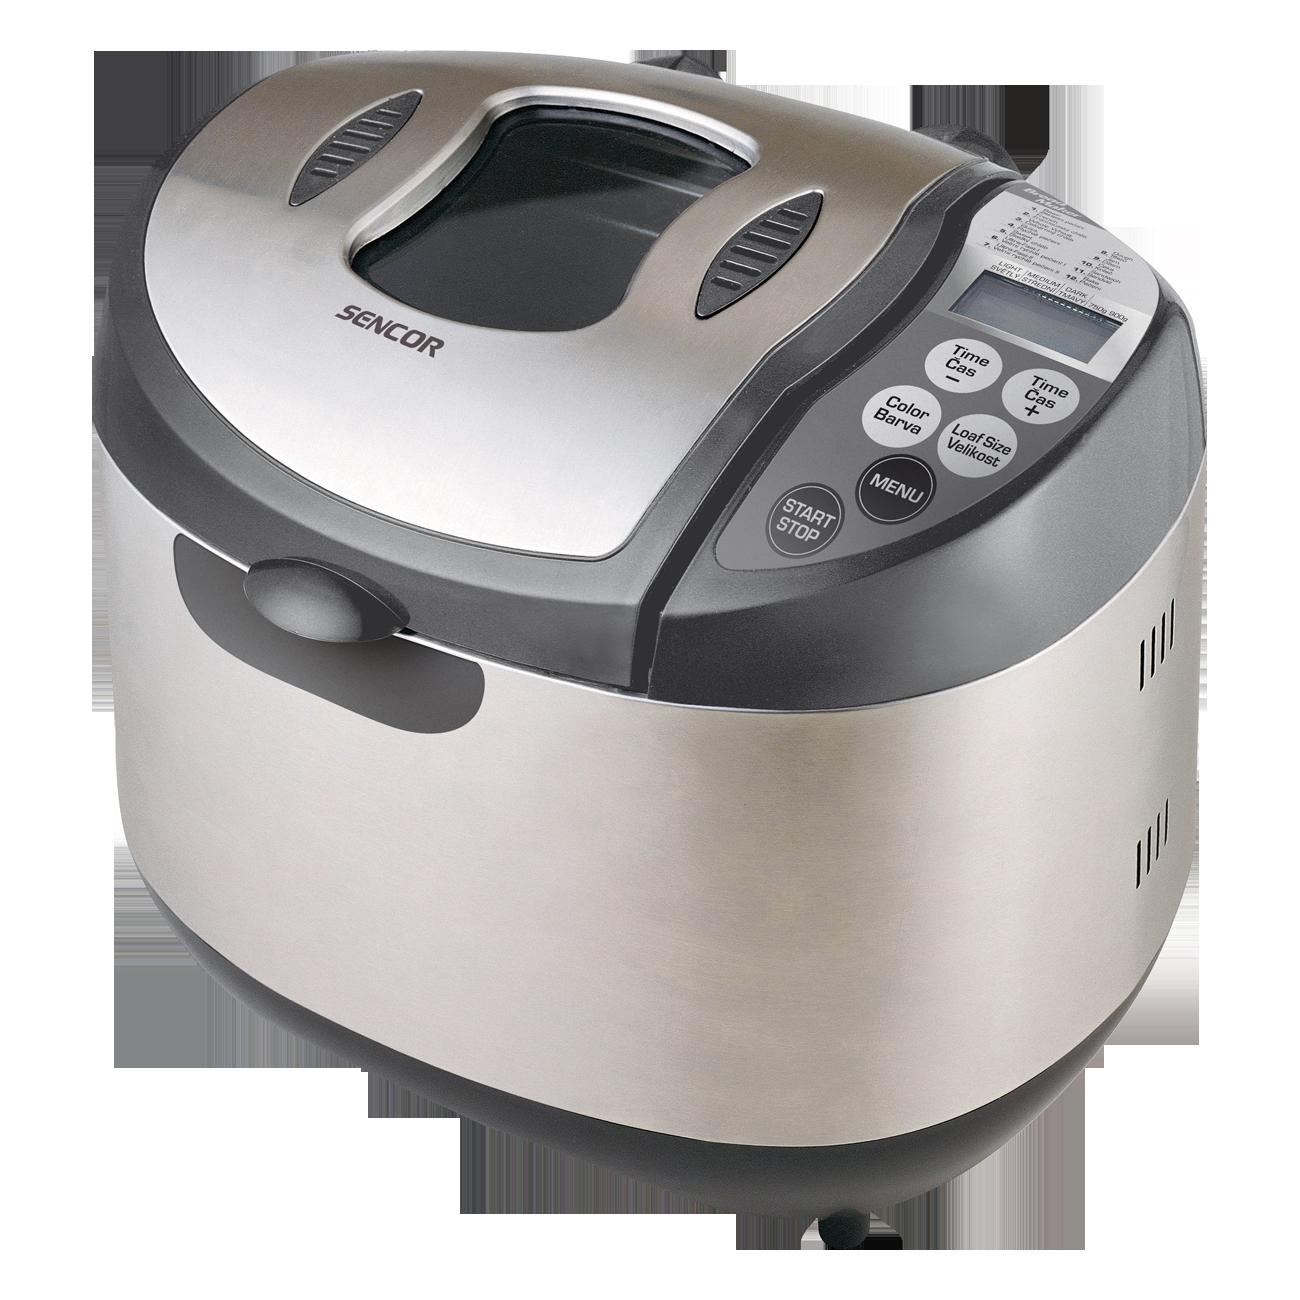 Bread cooker Sencor SBR930SS